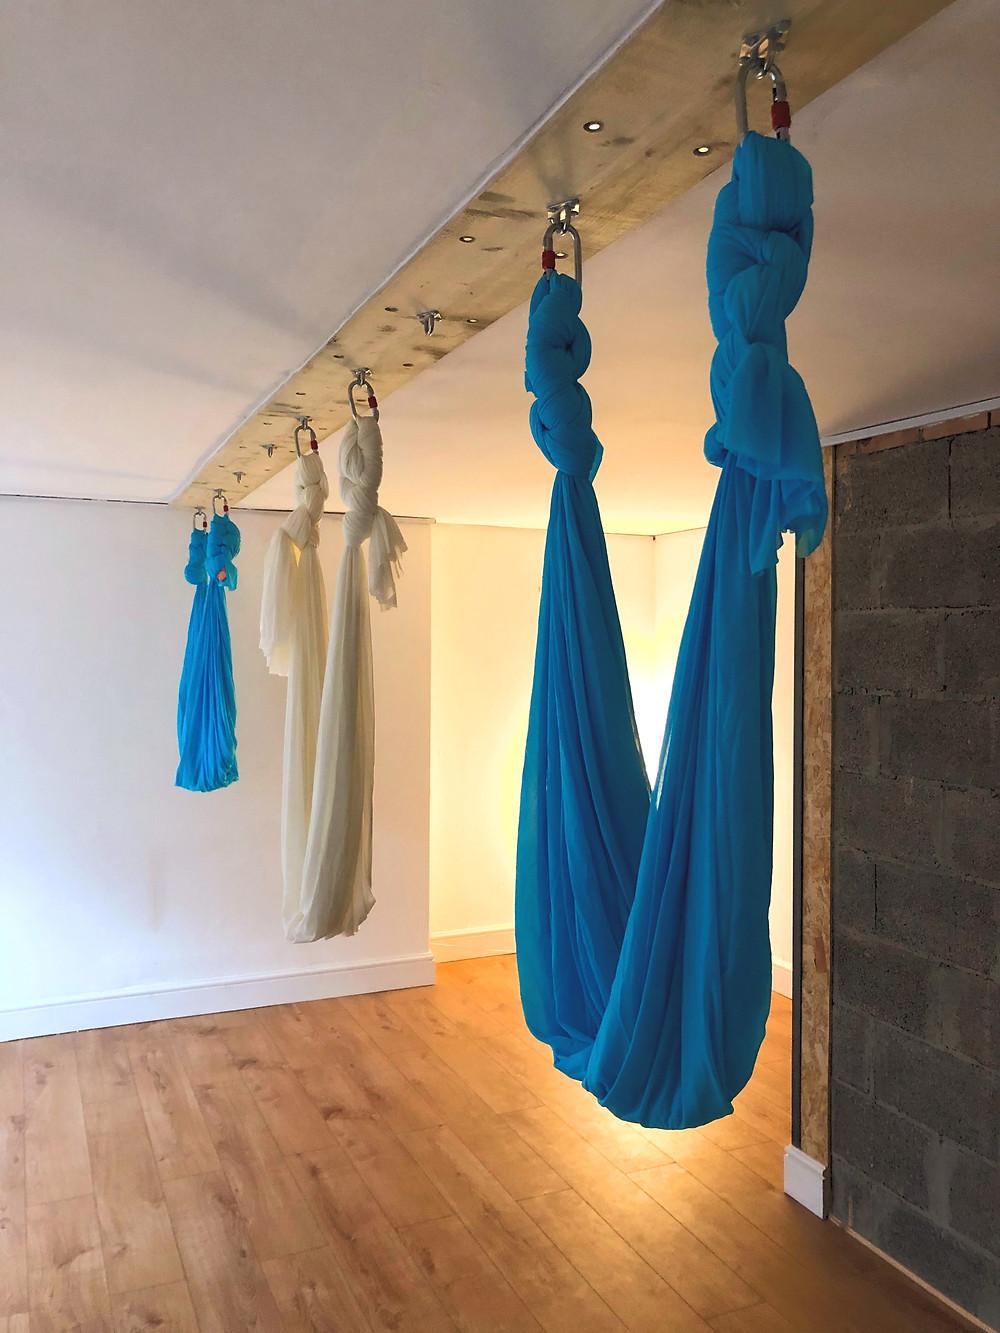 Aerial Yoga hammocks in the yoga studio in Clifton